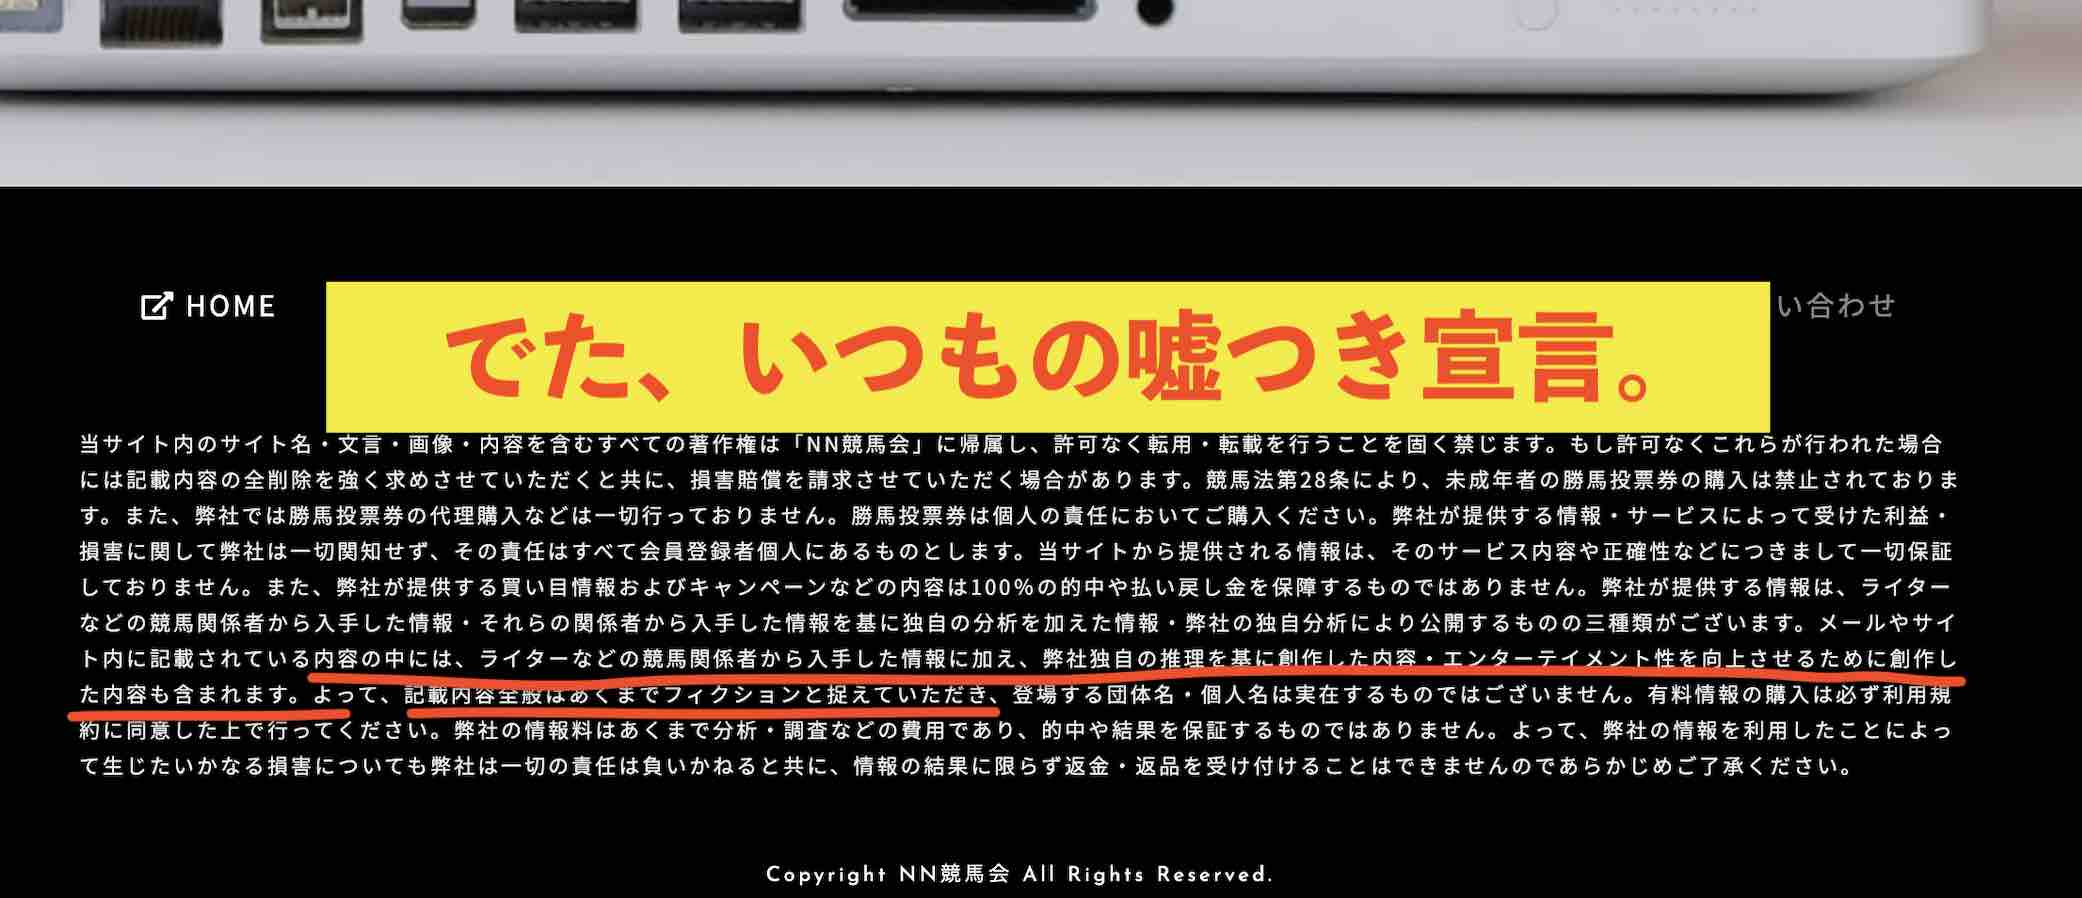 NN競馬会という競馬予想サイトの嘘つき宣言